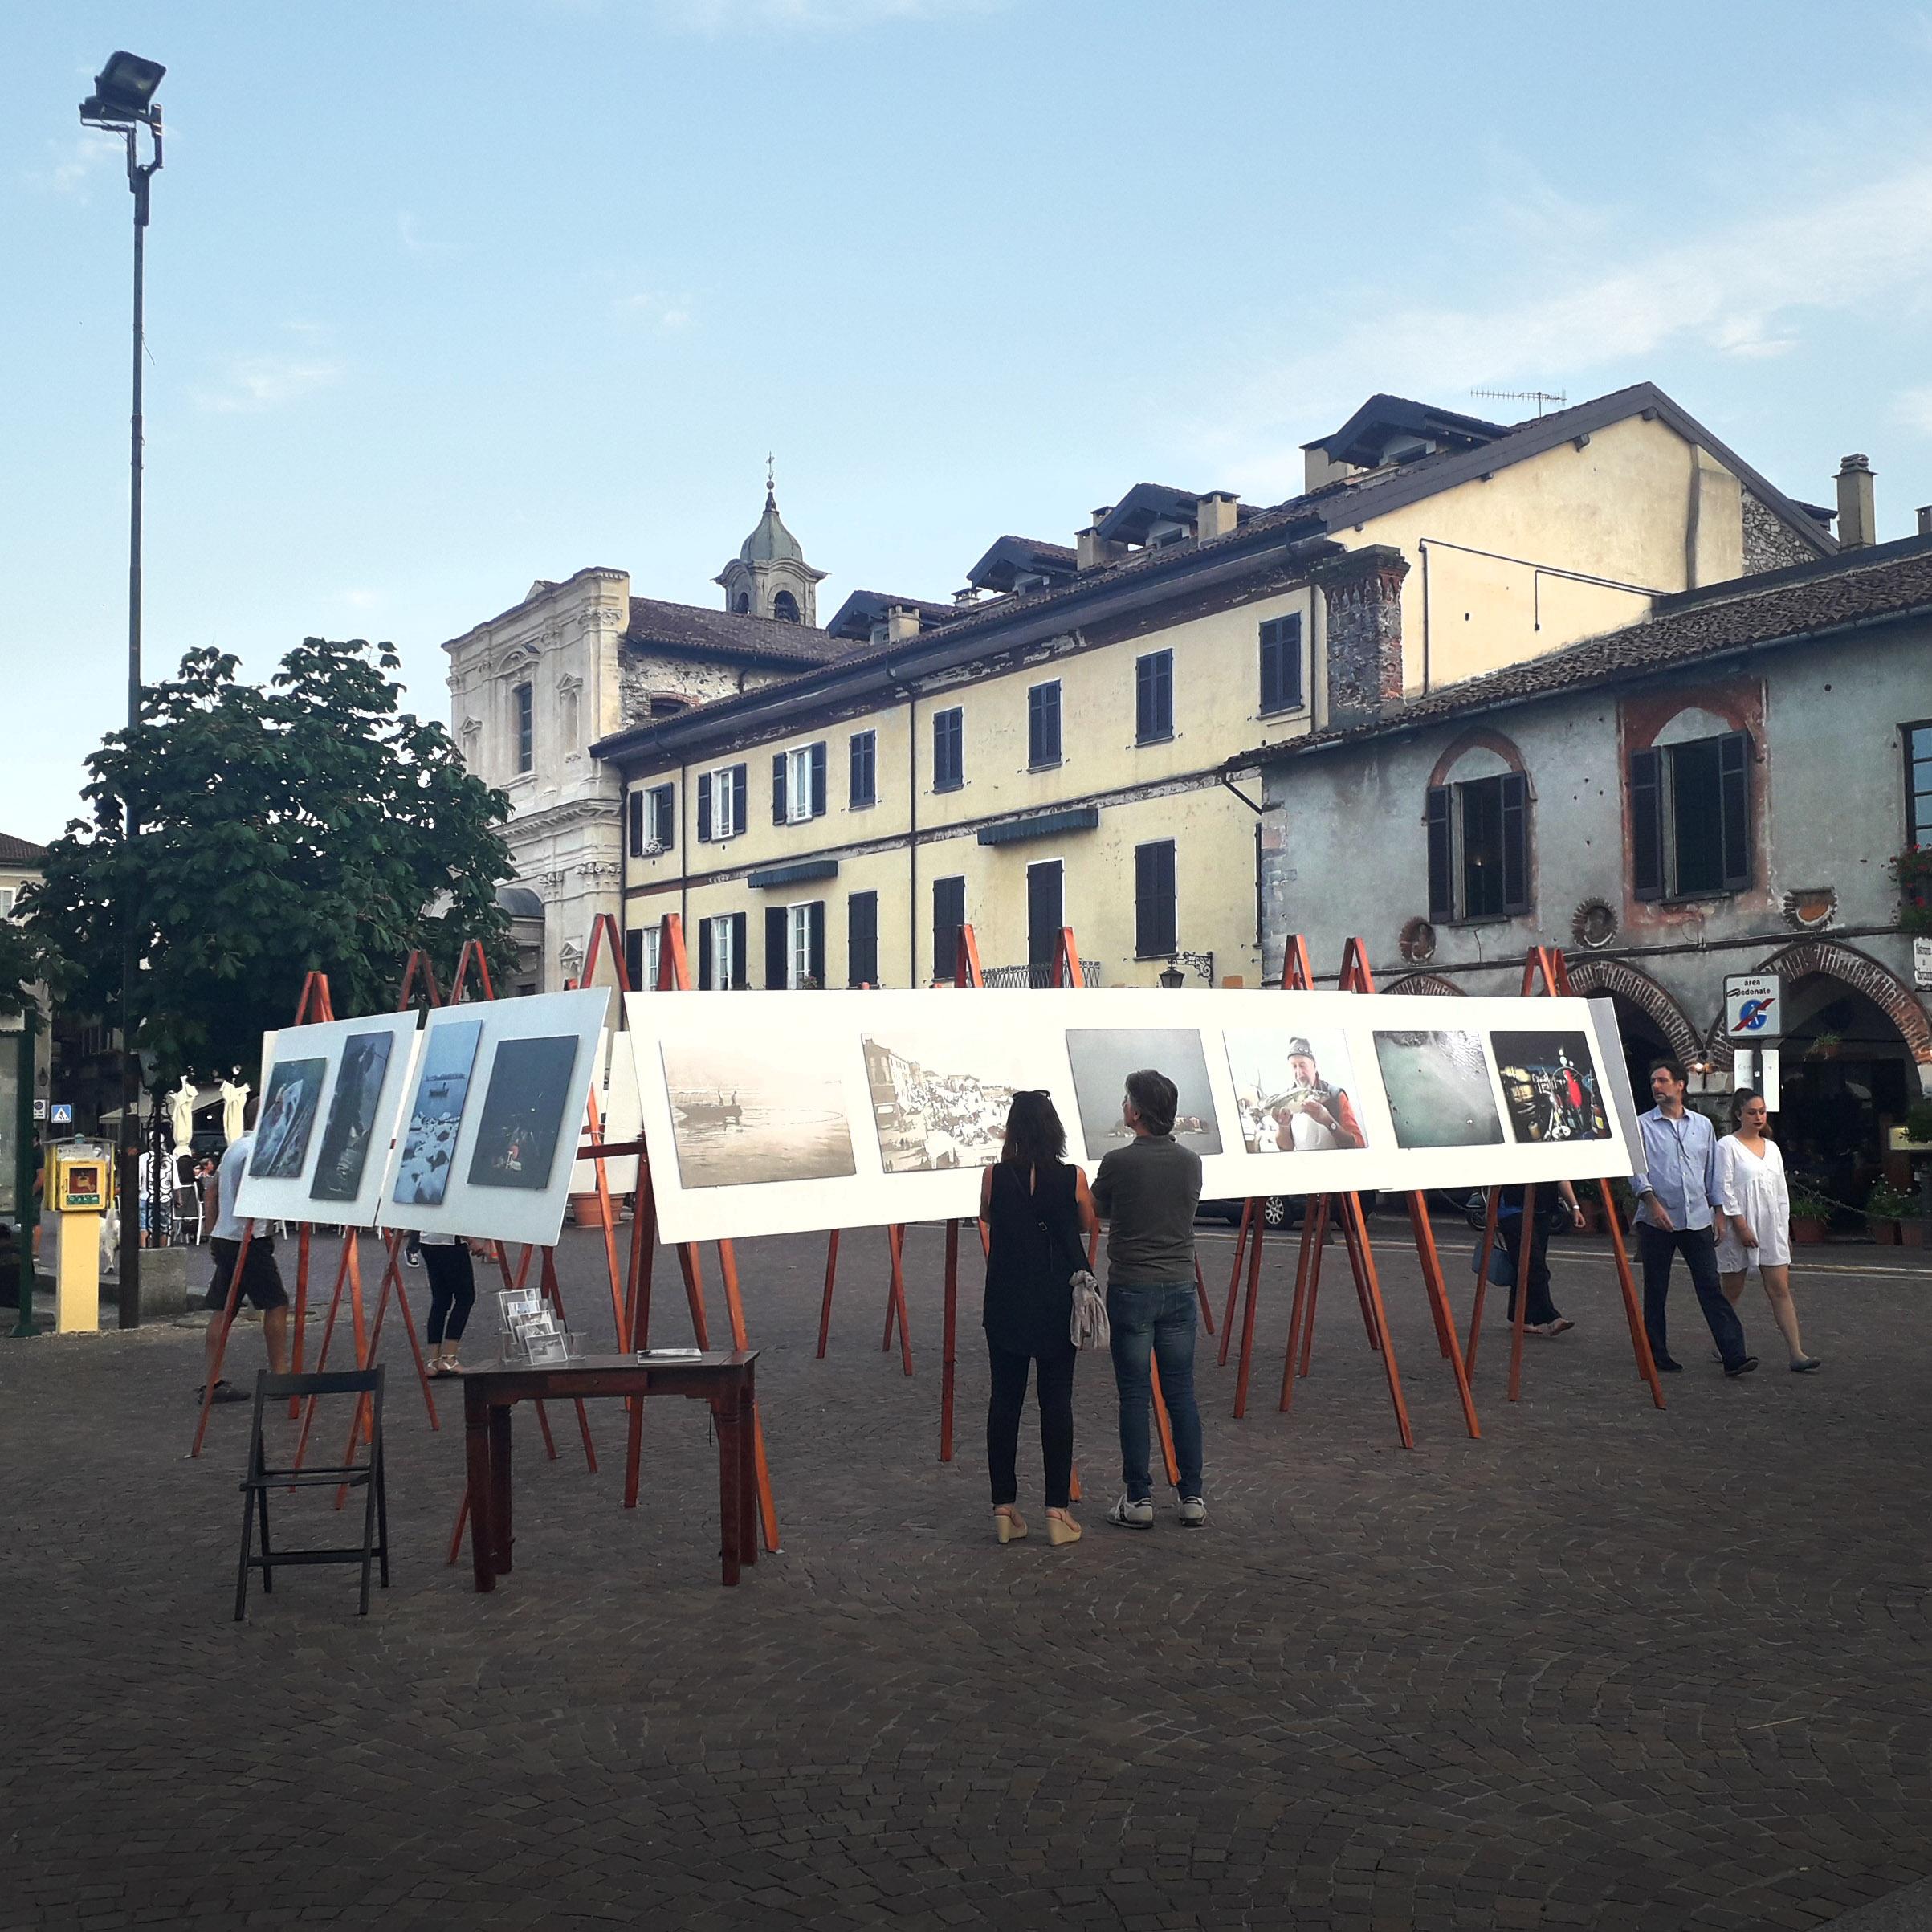 Arona, 17.07.2018 & 18.07.2018 - Piazza del popolo, 28041 Arona